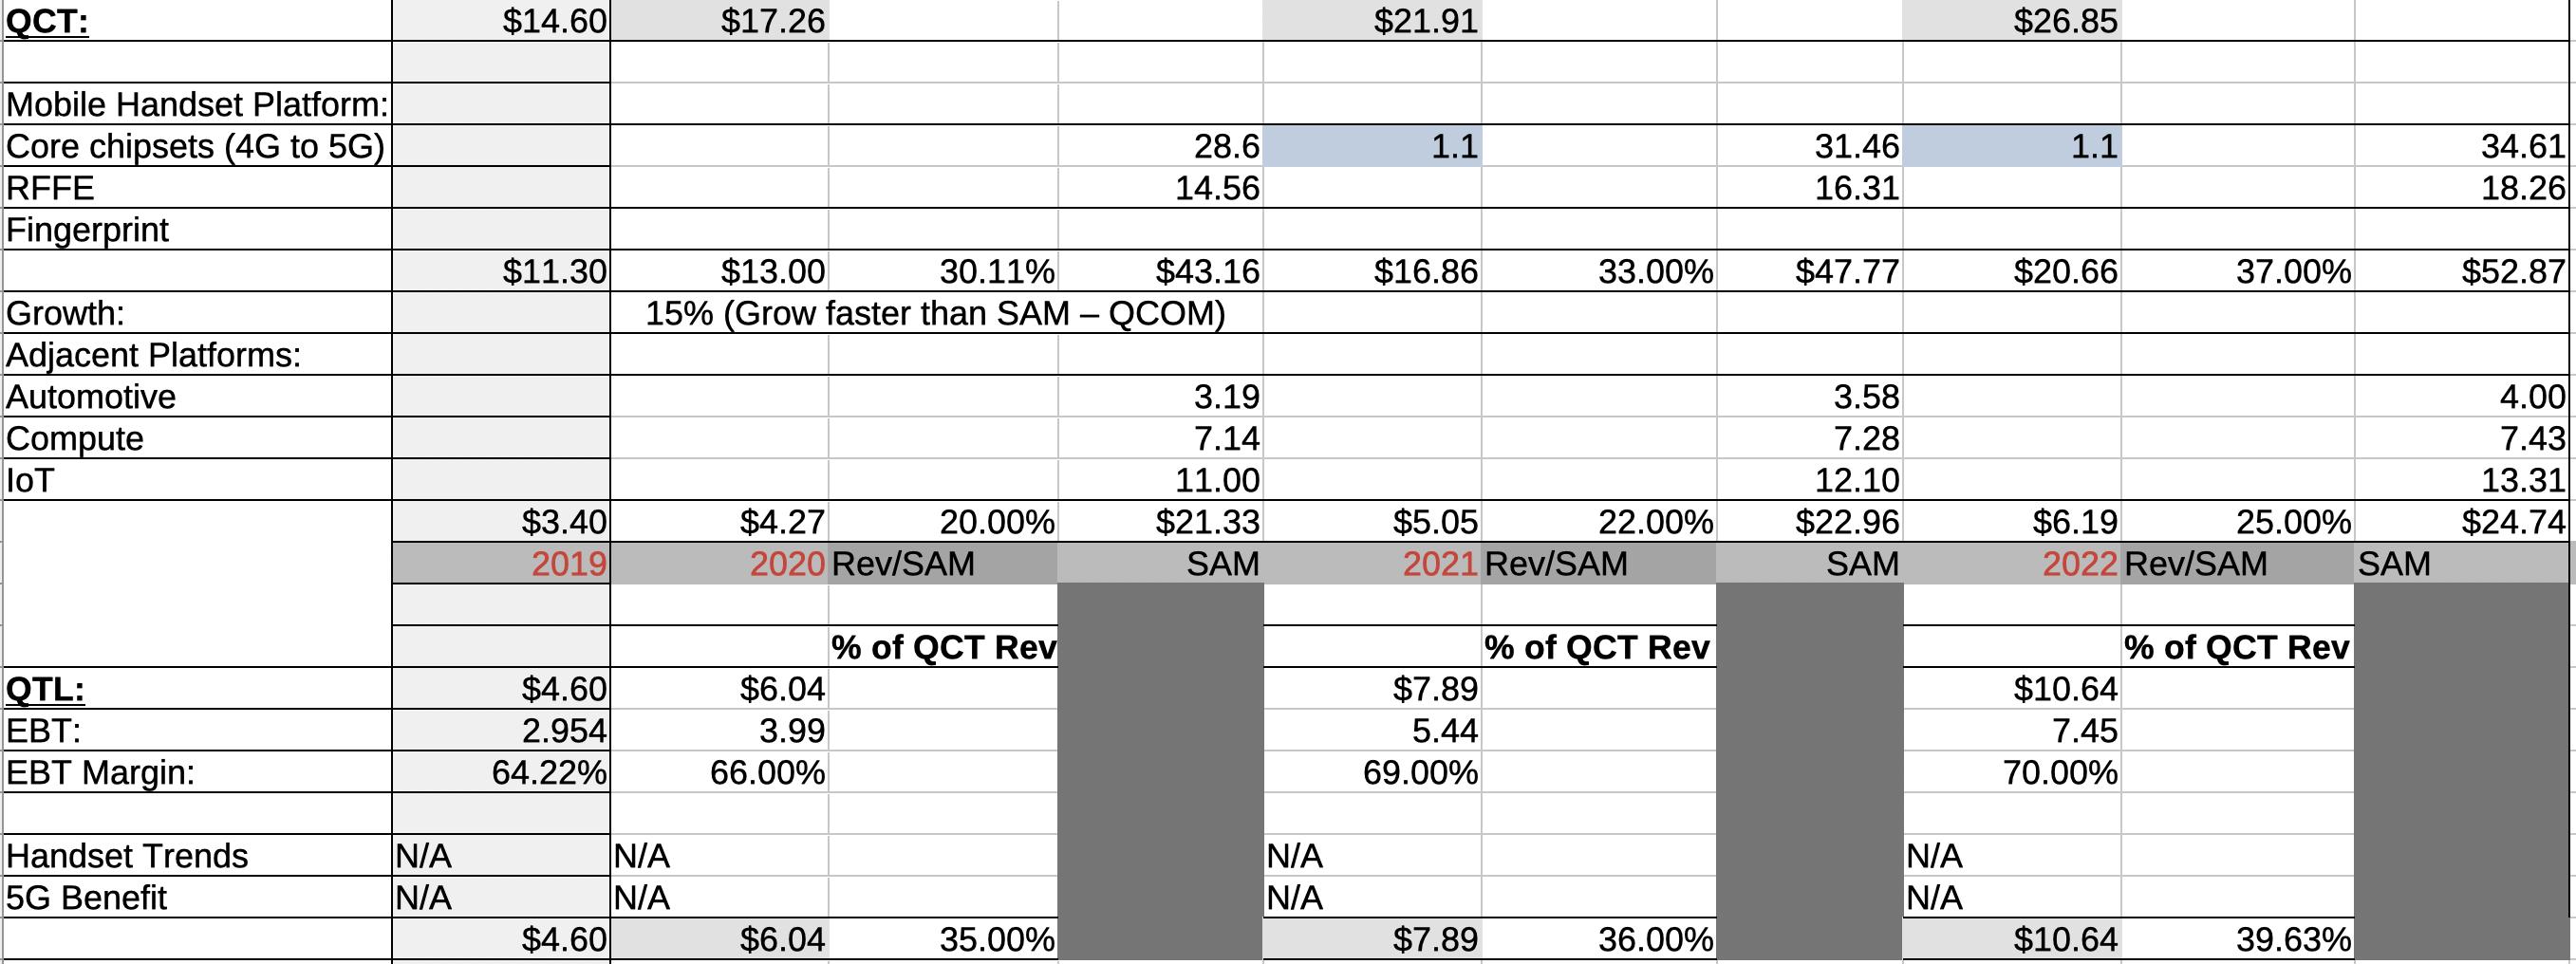 Analyzing impact of 5G iPhone on Qualcomm revenue